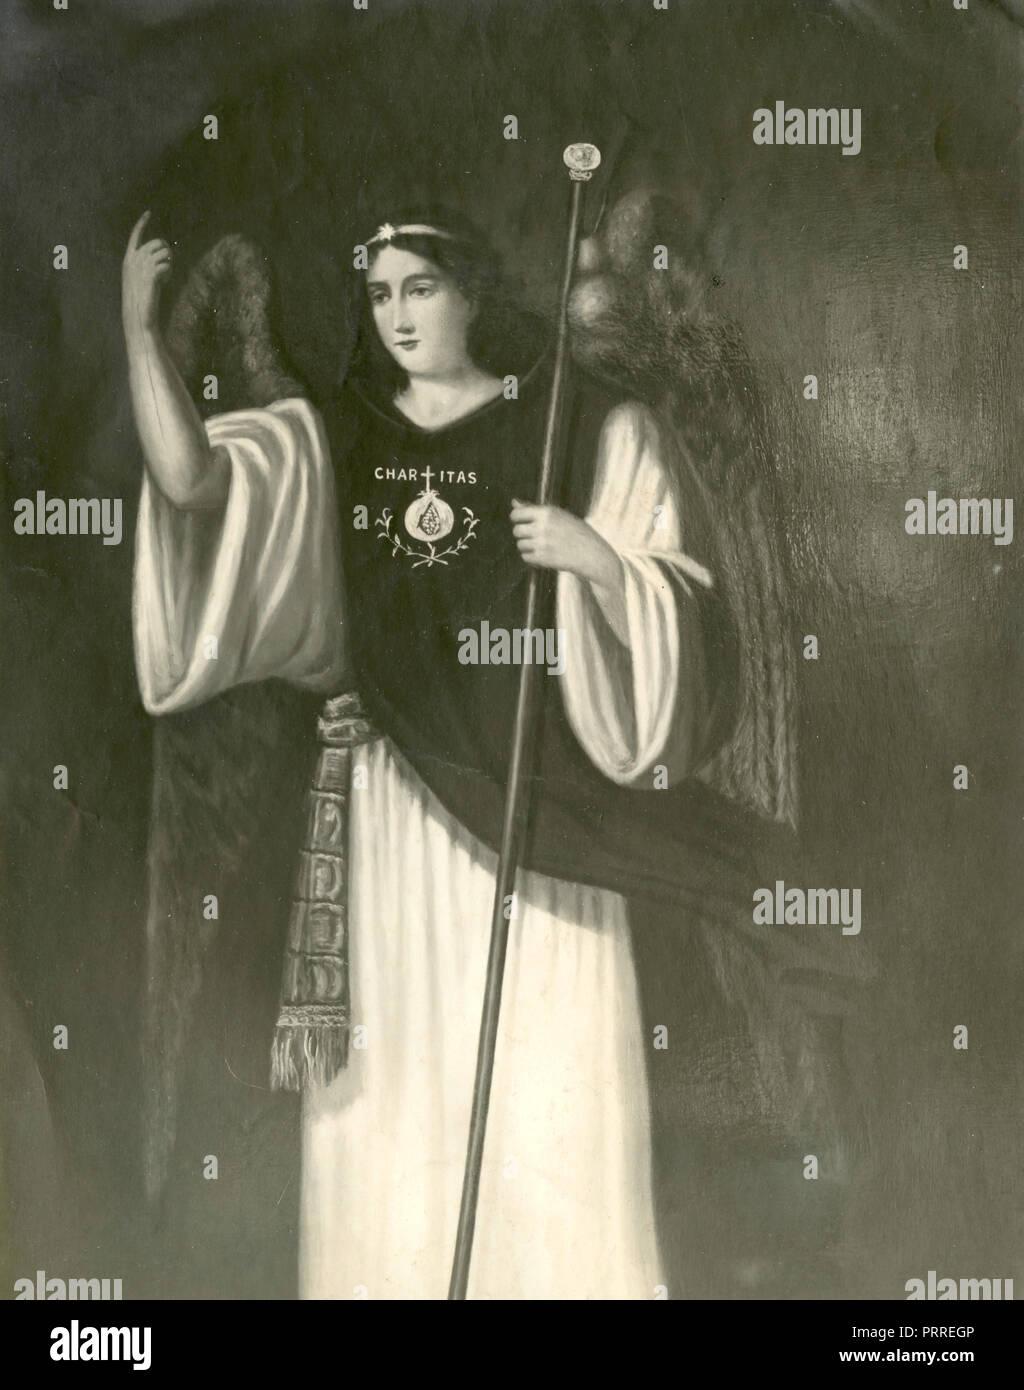 St. Raphael Archangel, painting 1930s - Stock Image